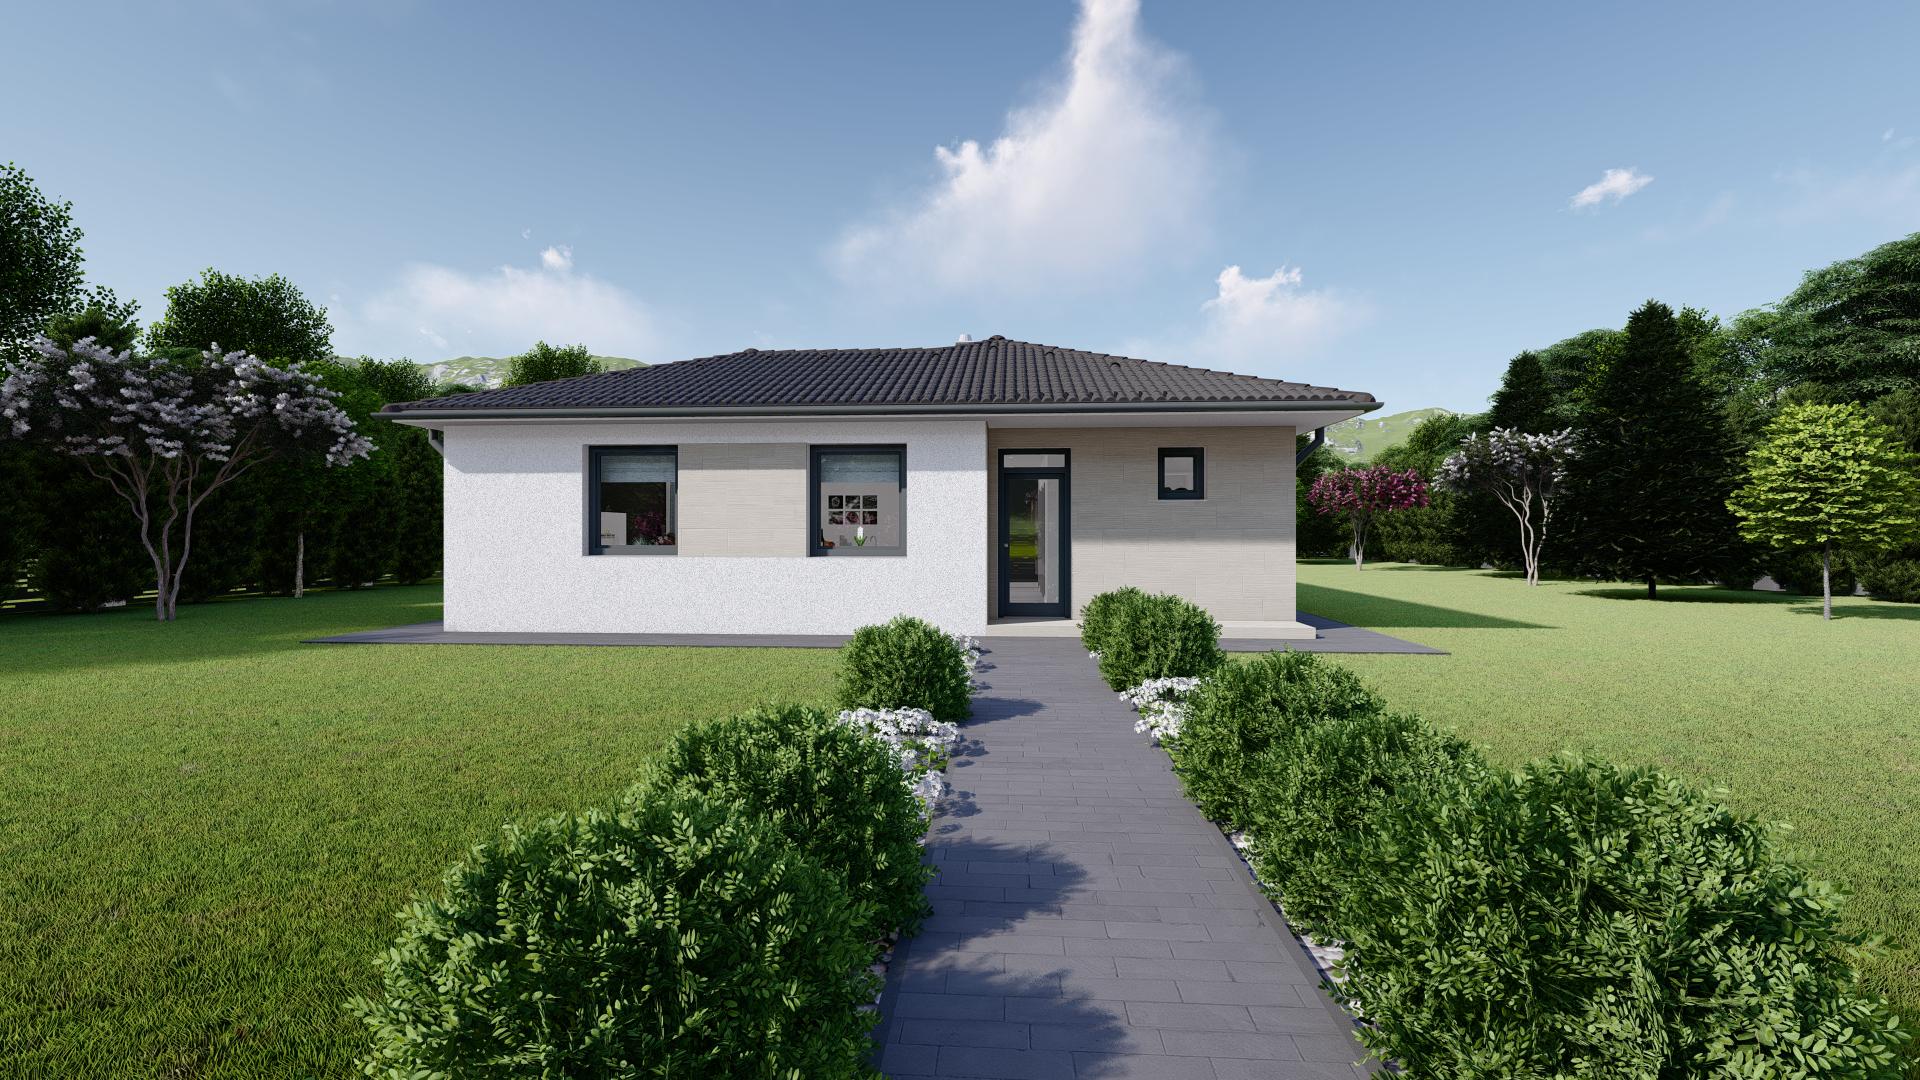 Projekt domu LEA 5 vizualizácia vchodu